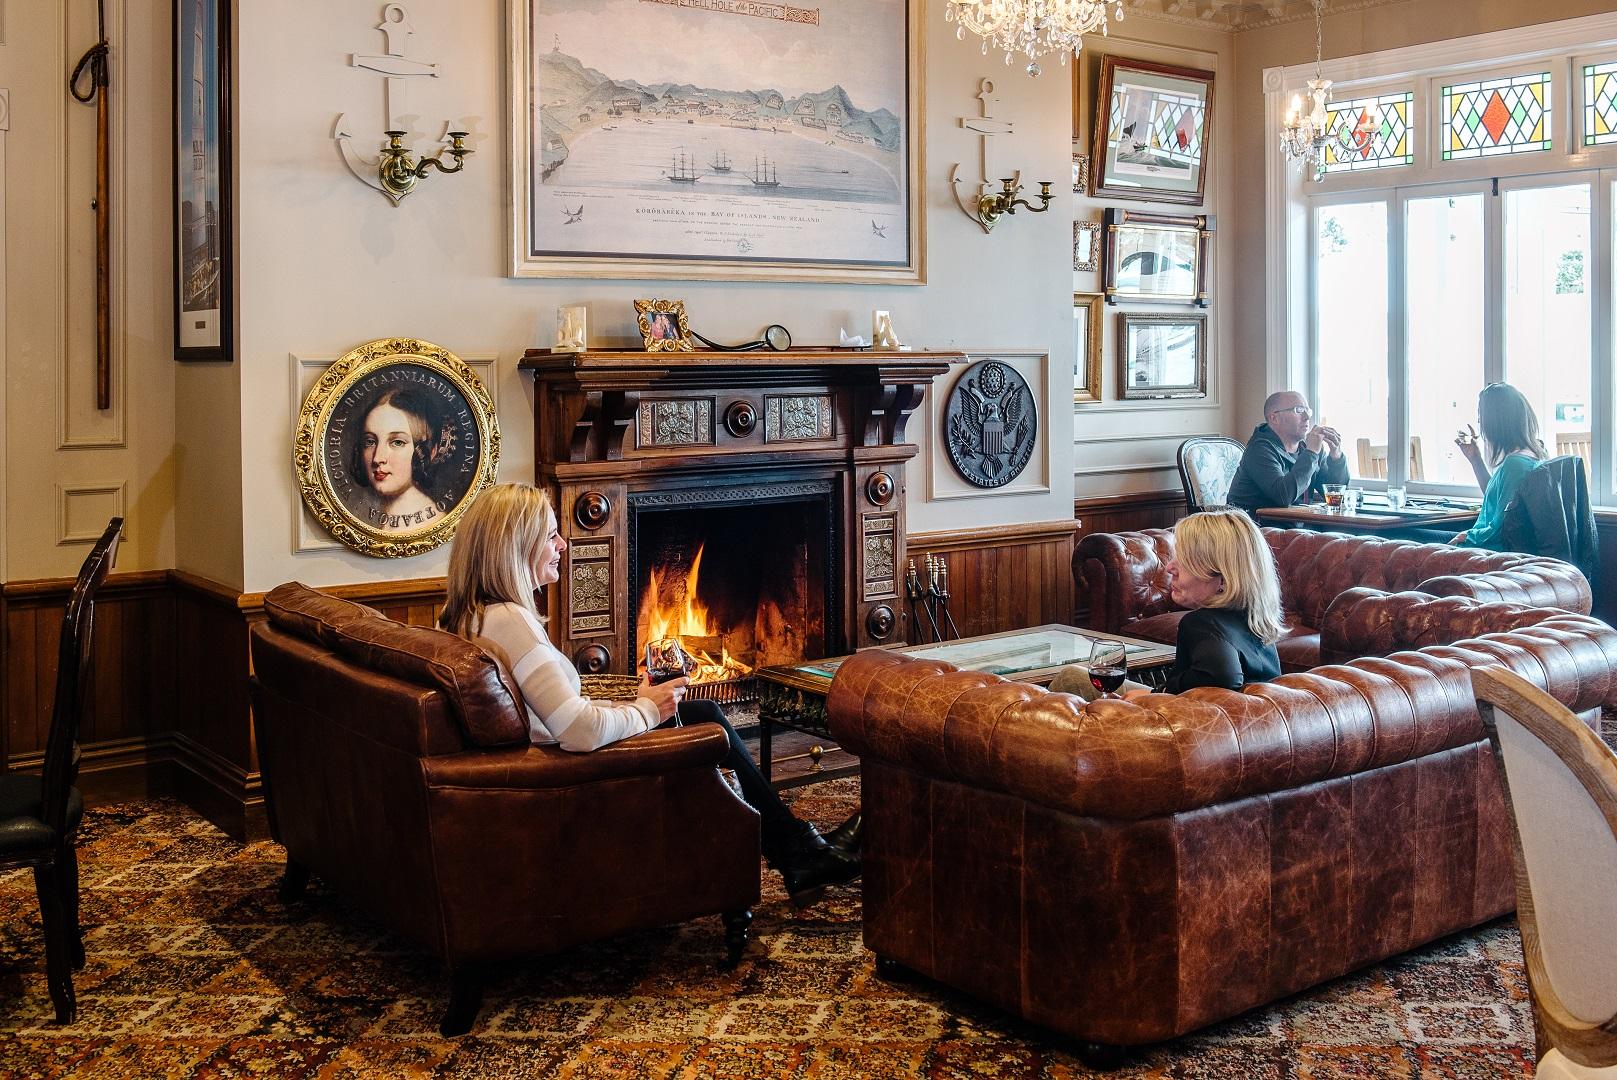 20170925_31-fireplace-with-window.jpg